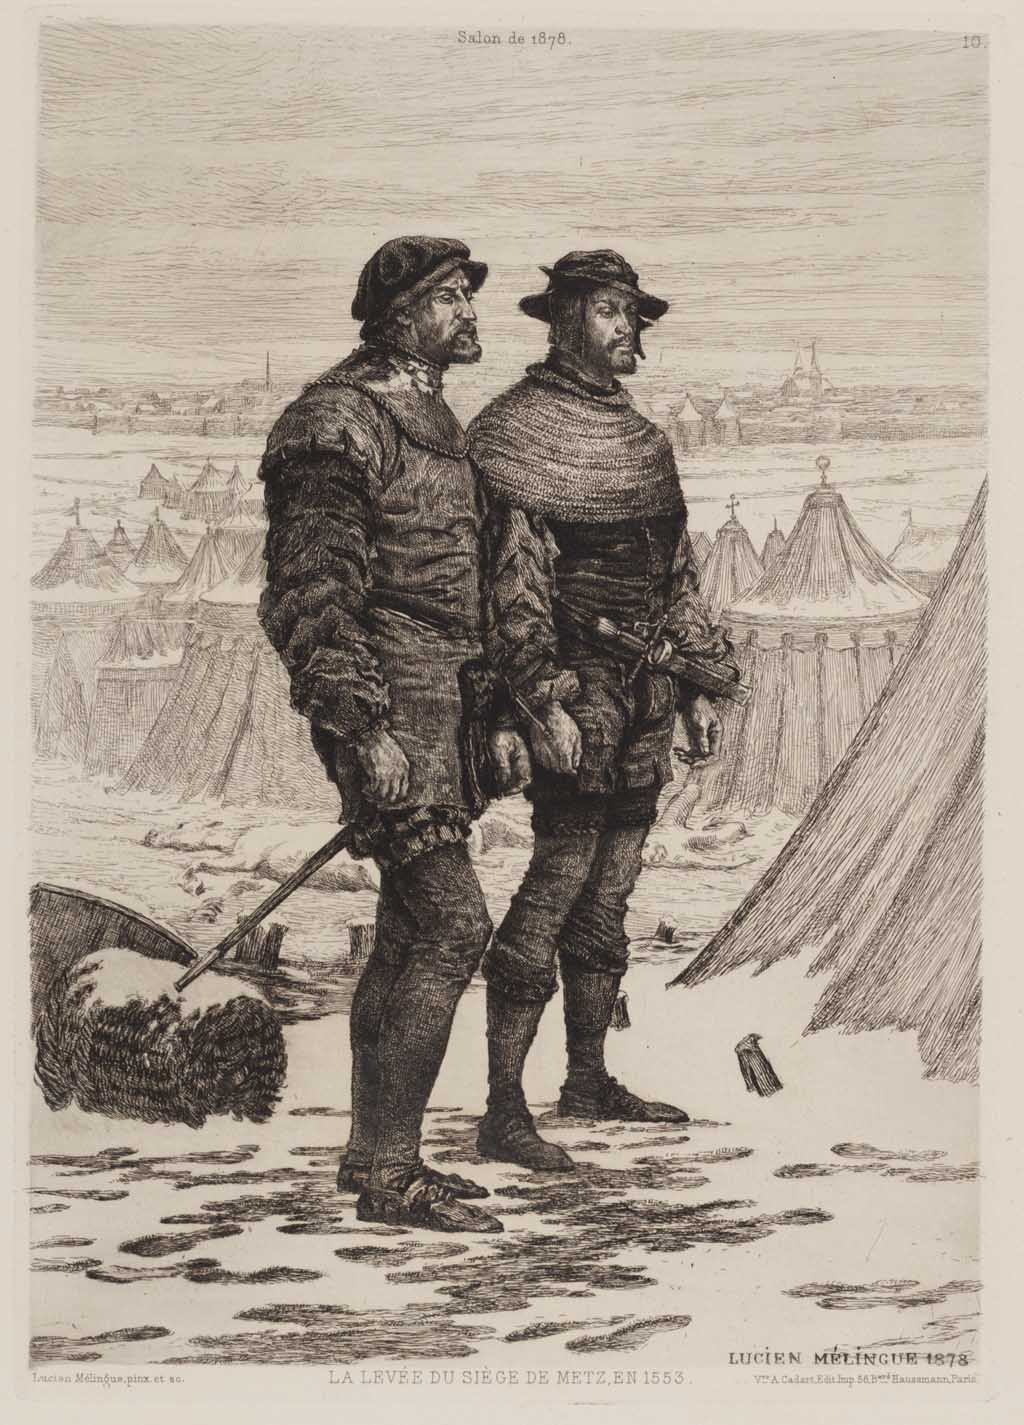 La levée du siège de Metz en 1553